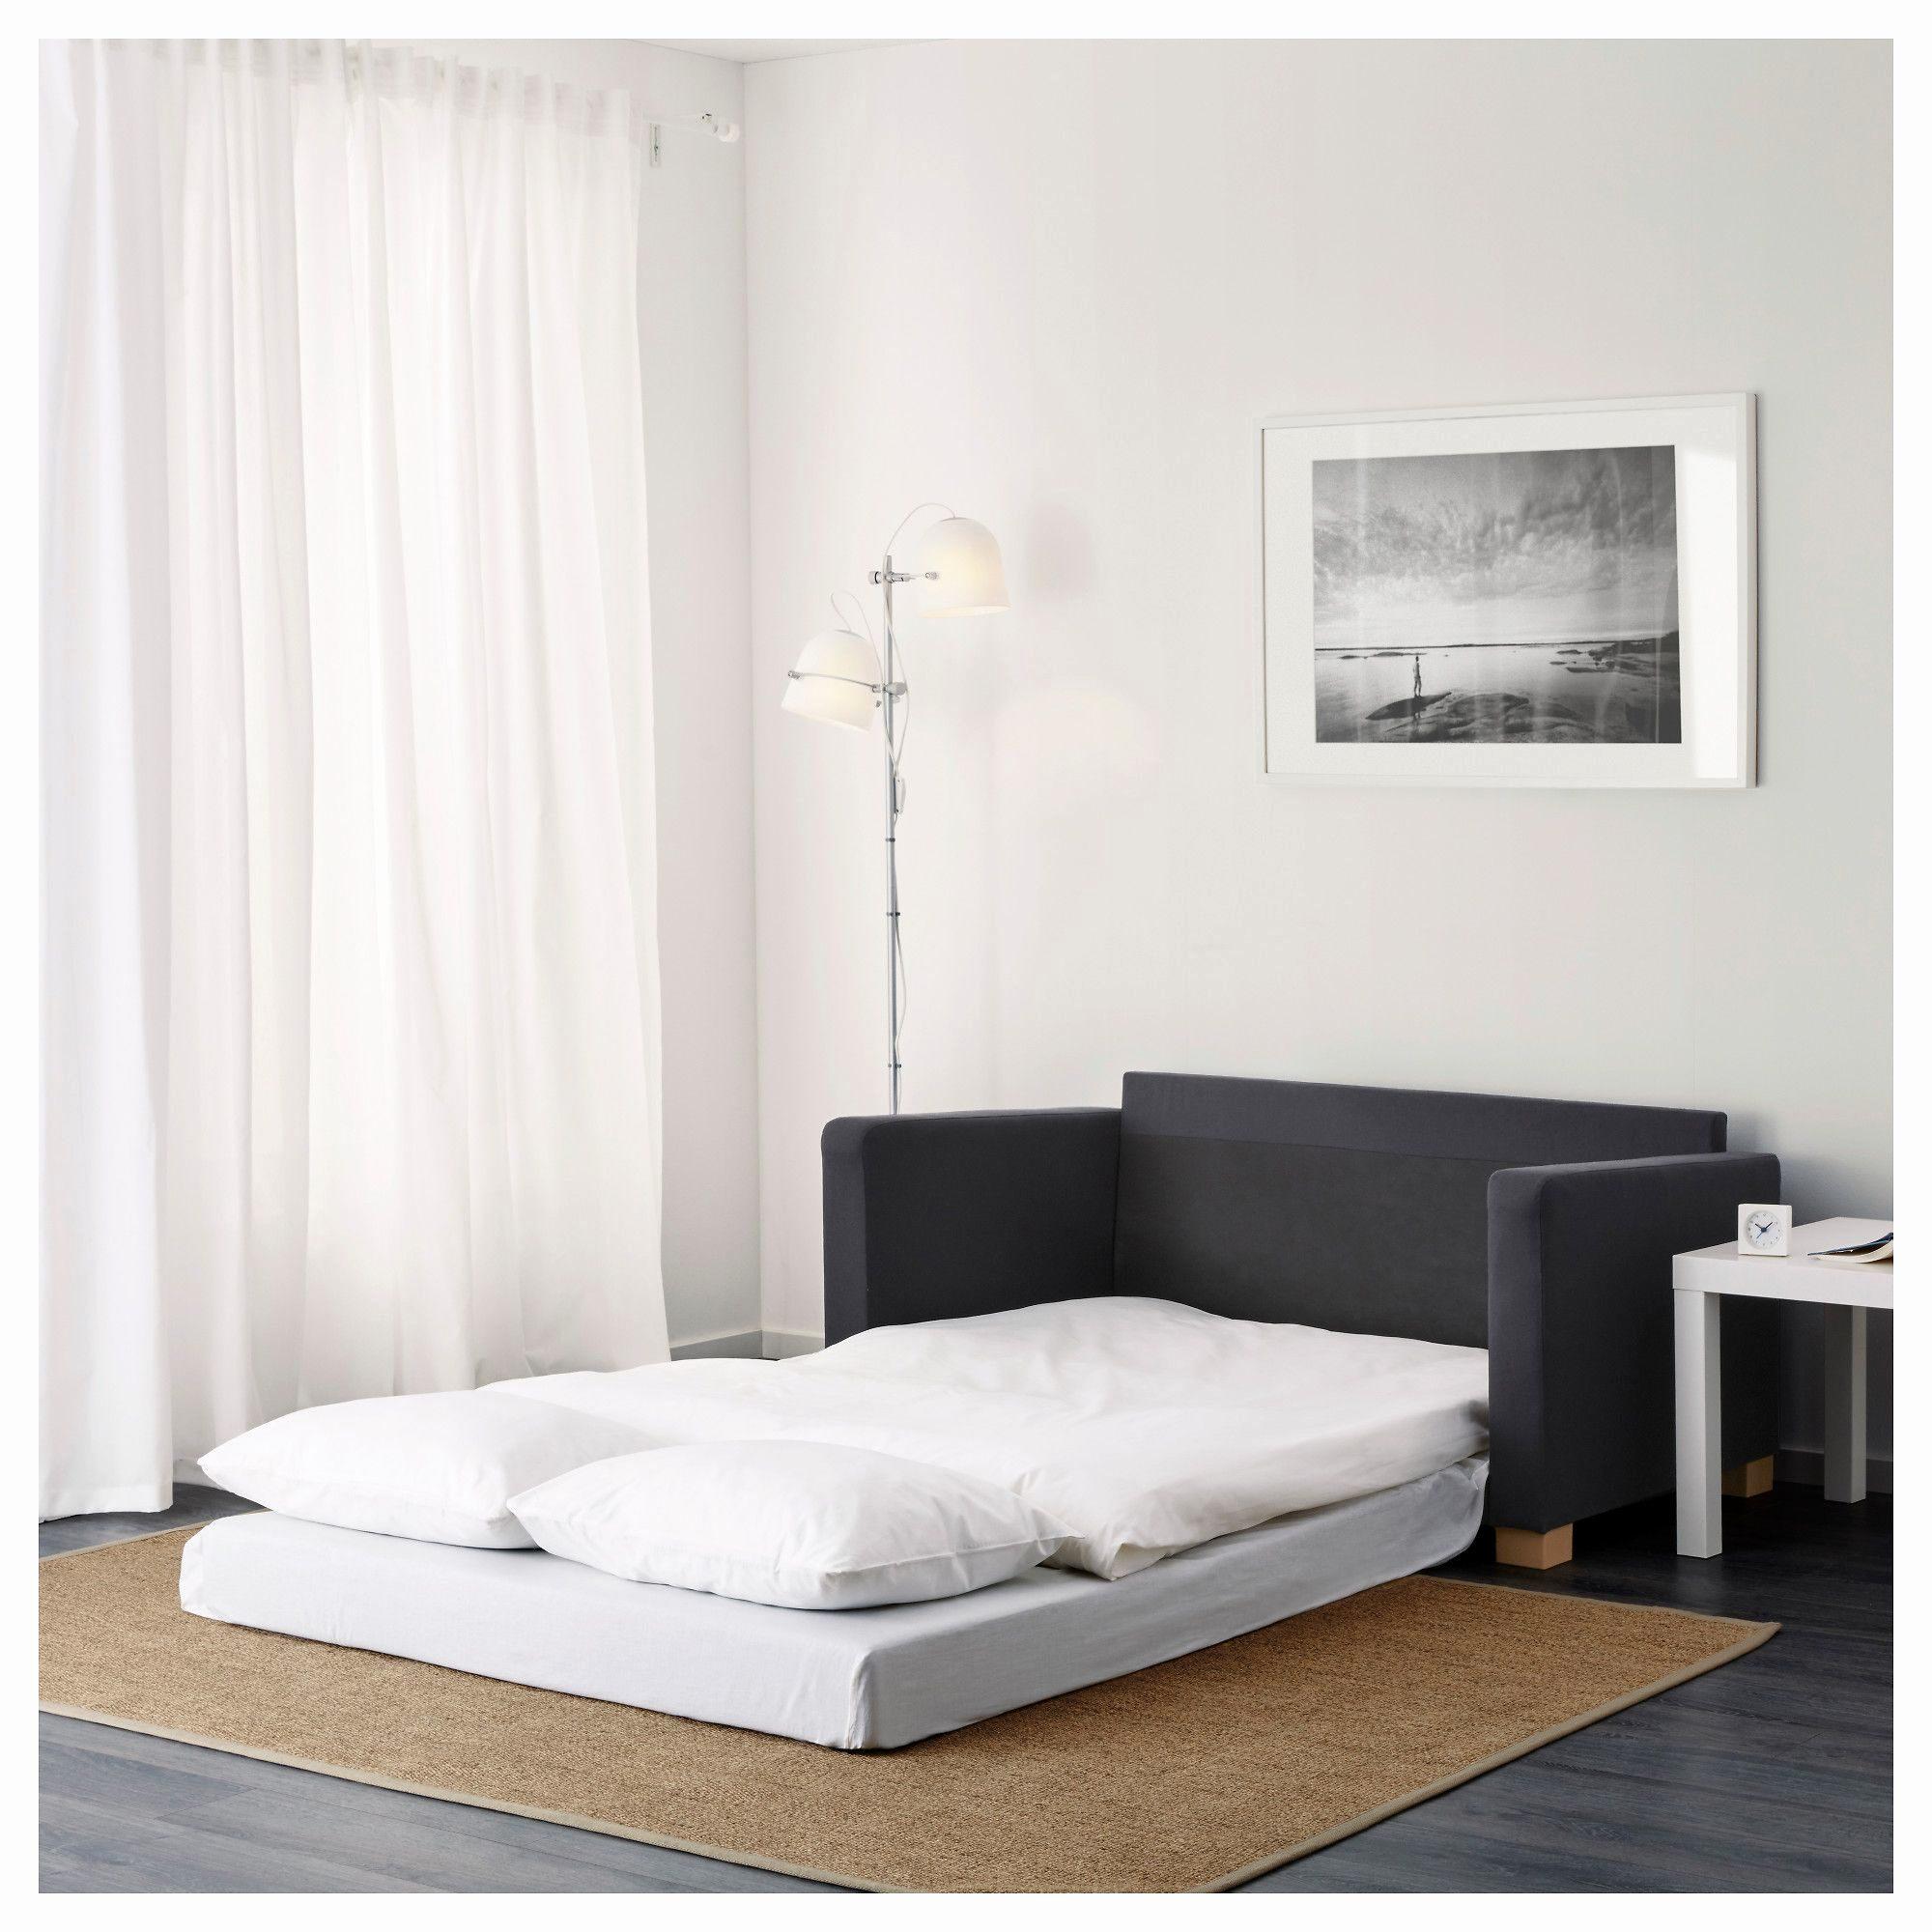 Banquette Lit Ikea Inspirant Interior 50 Inspirational Ikea sofa